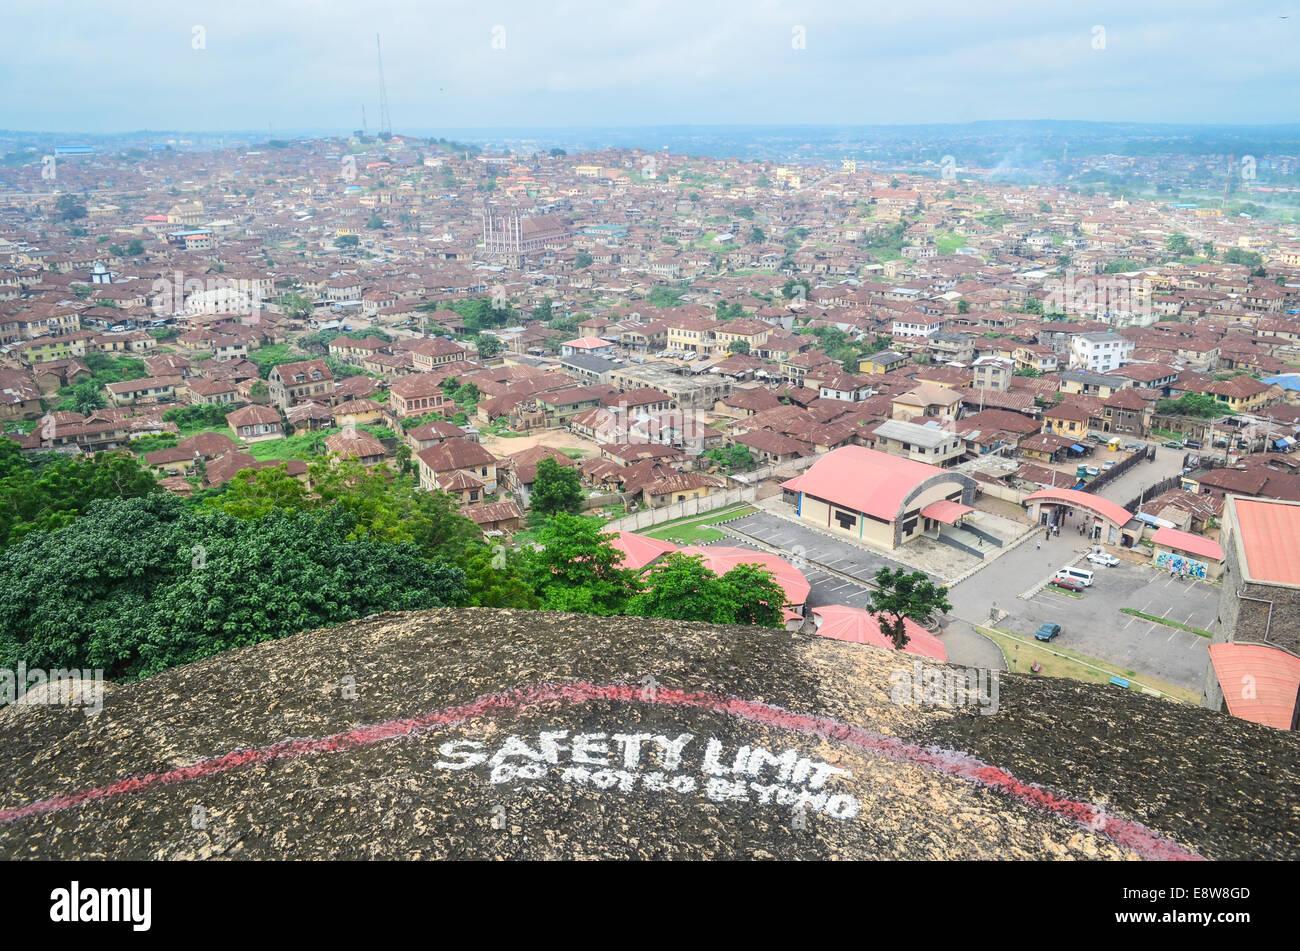 Aerial view of the city of Abeokuta, kogi Nigeria